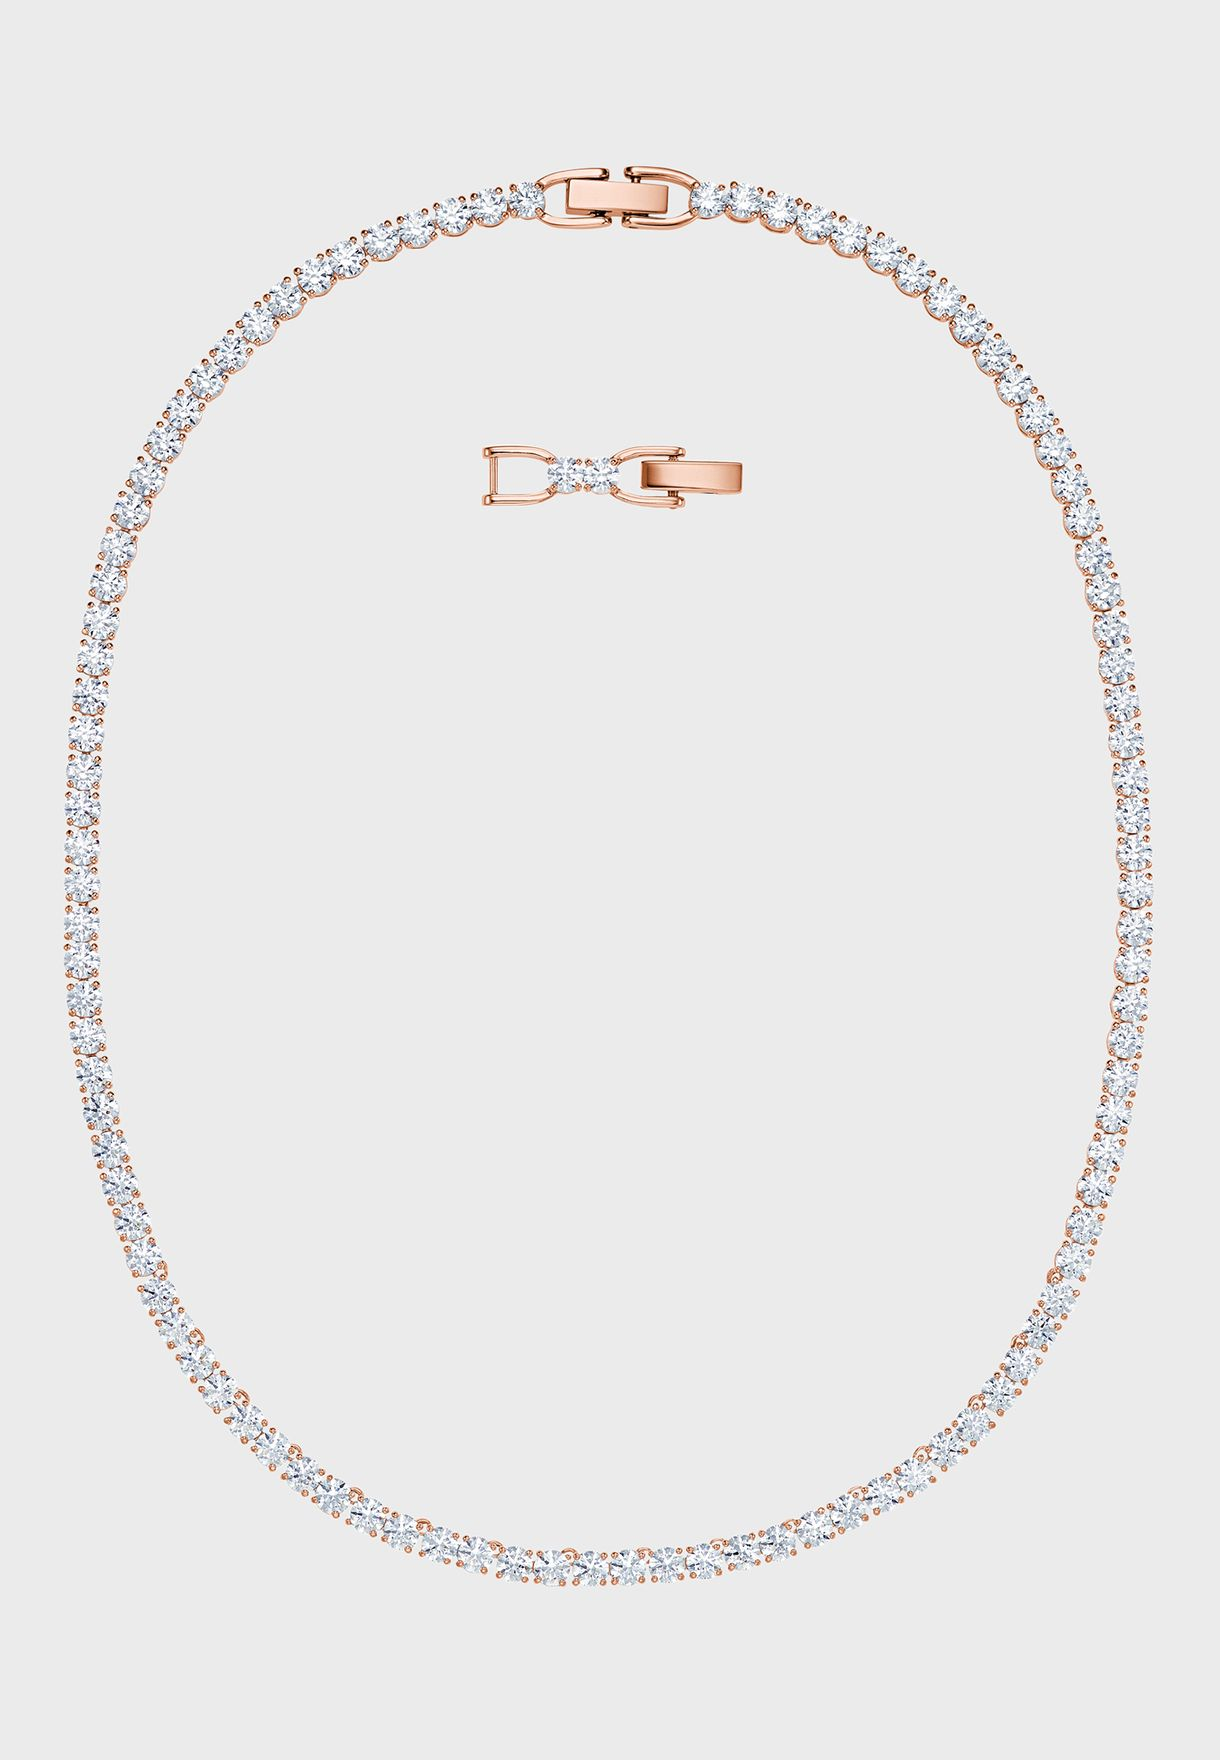 Tennis Deluxe Around Necklace